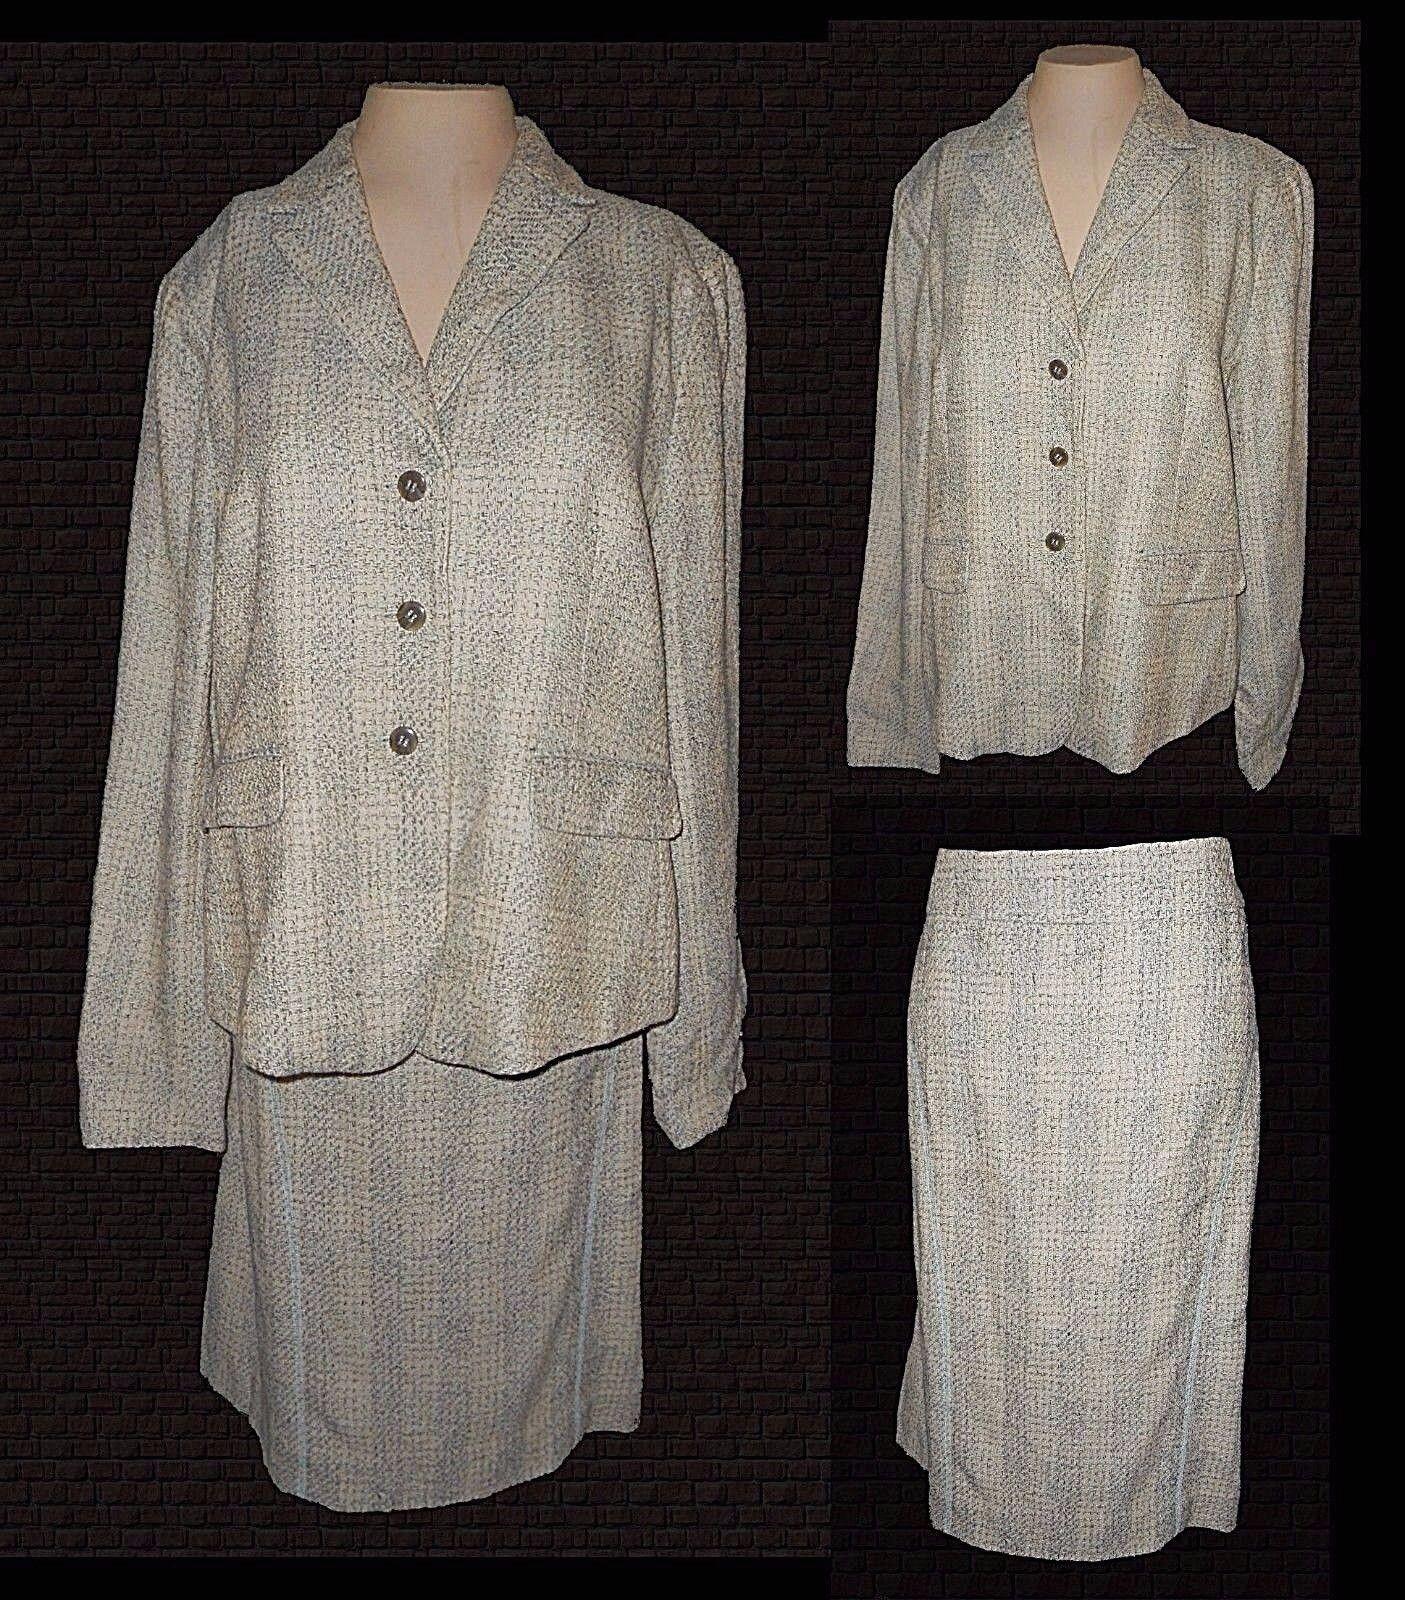 2-PC Suit  Blazer & Skirt, Jones New York, Cotton-Silk-blend Tweed 14